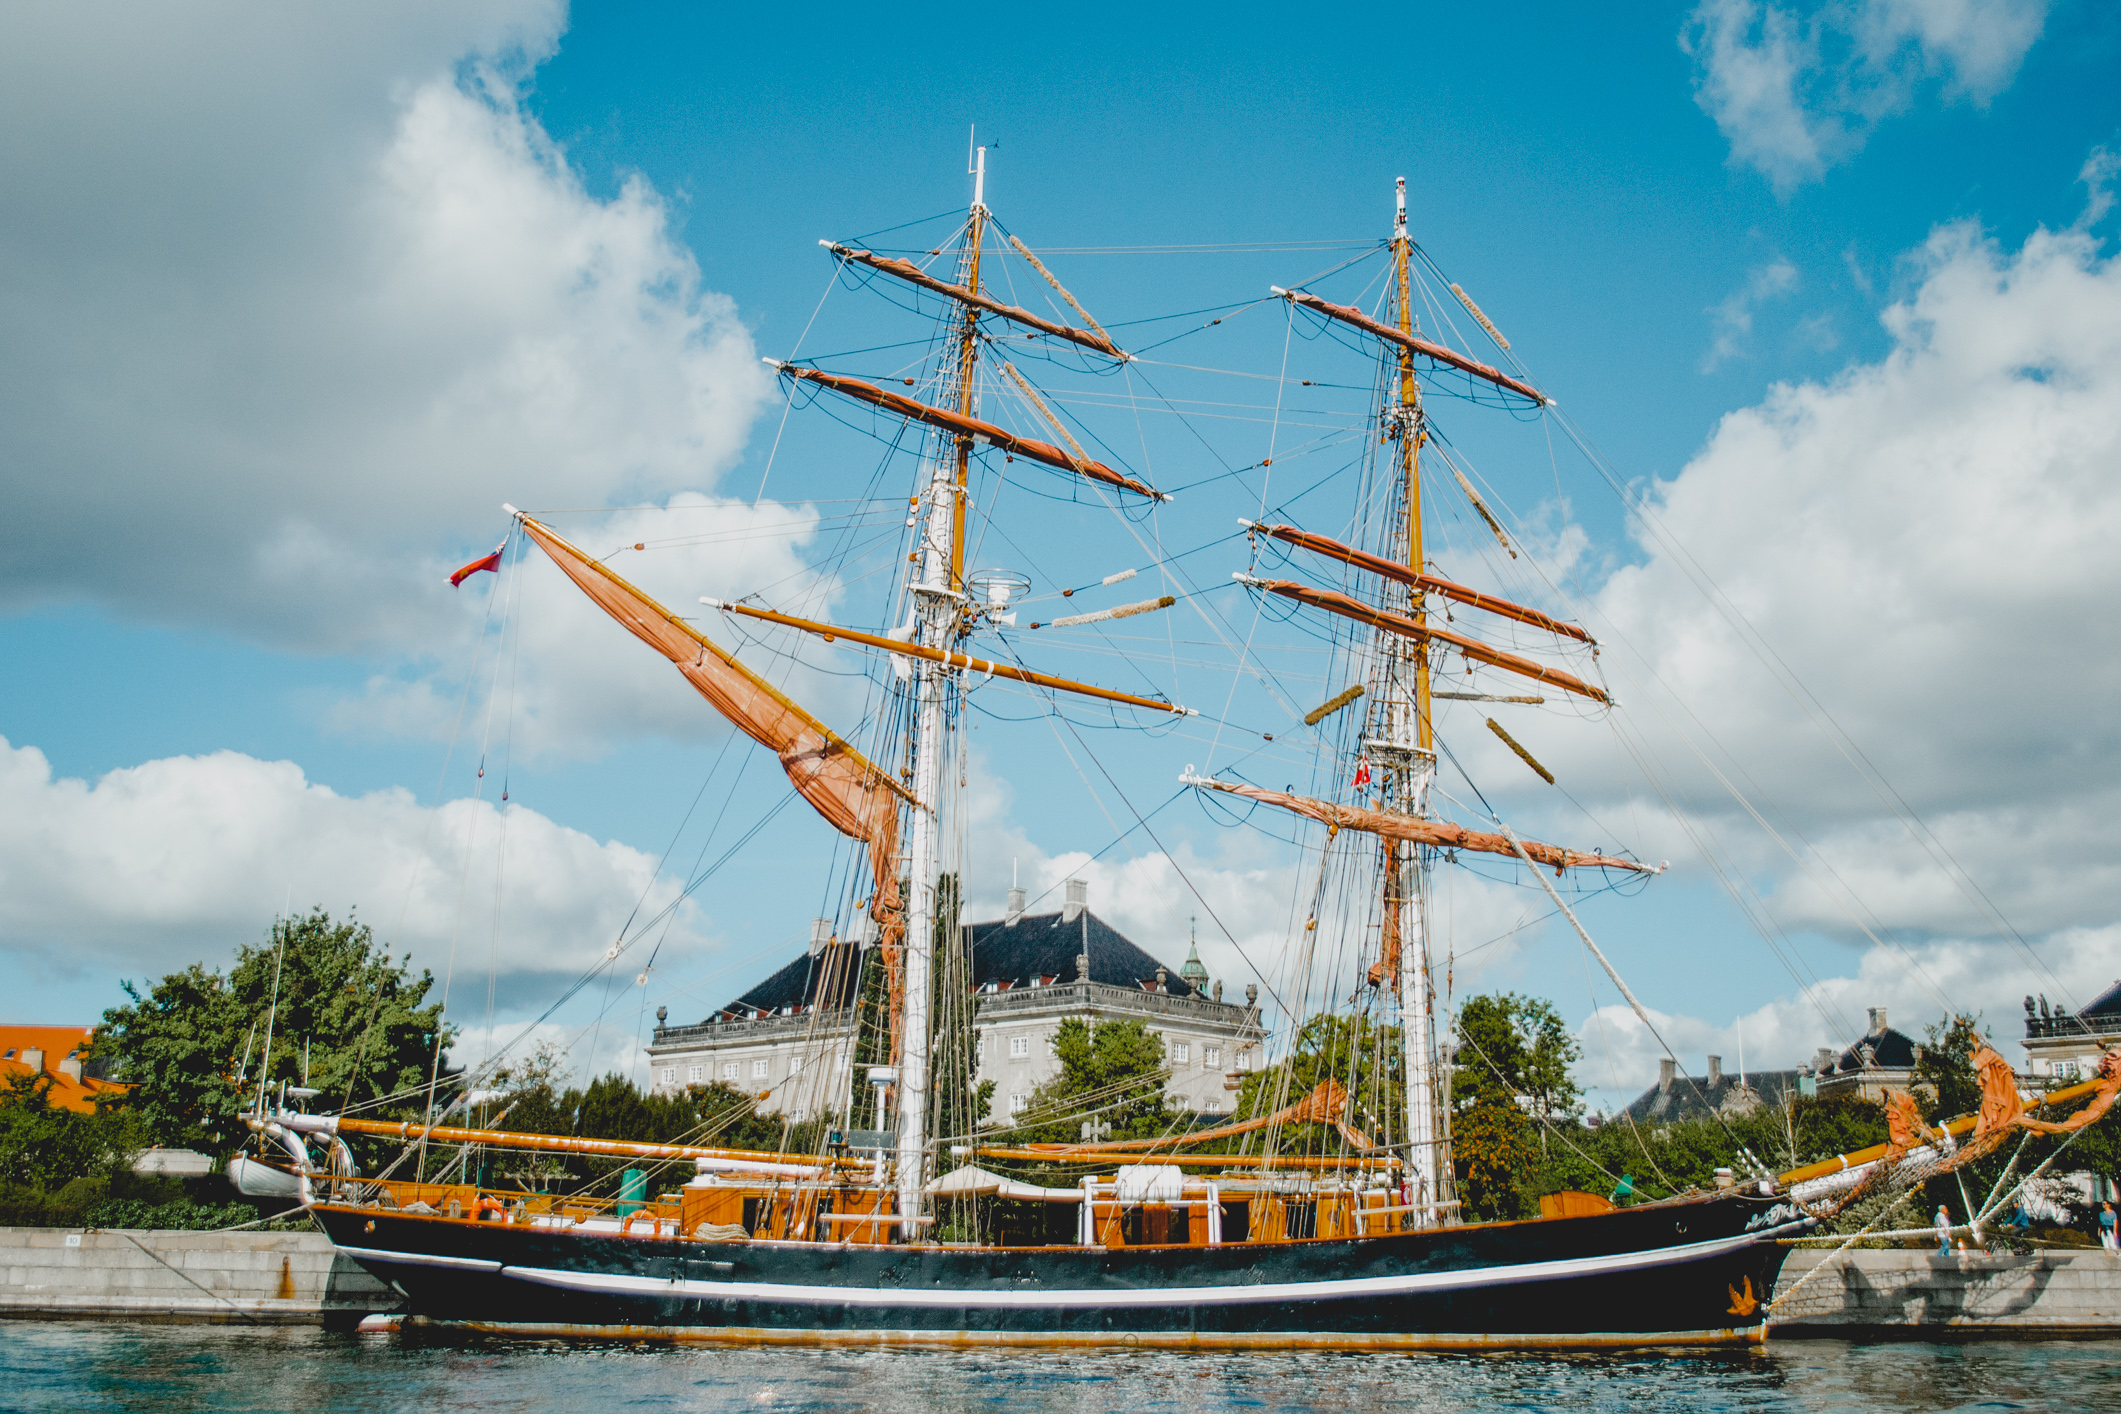 olapi-creative-travel-guide-copenhagen-boats